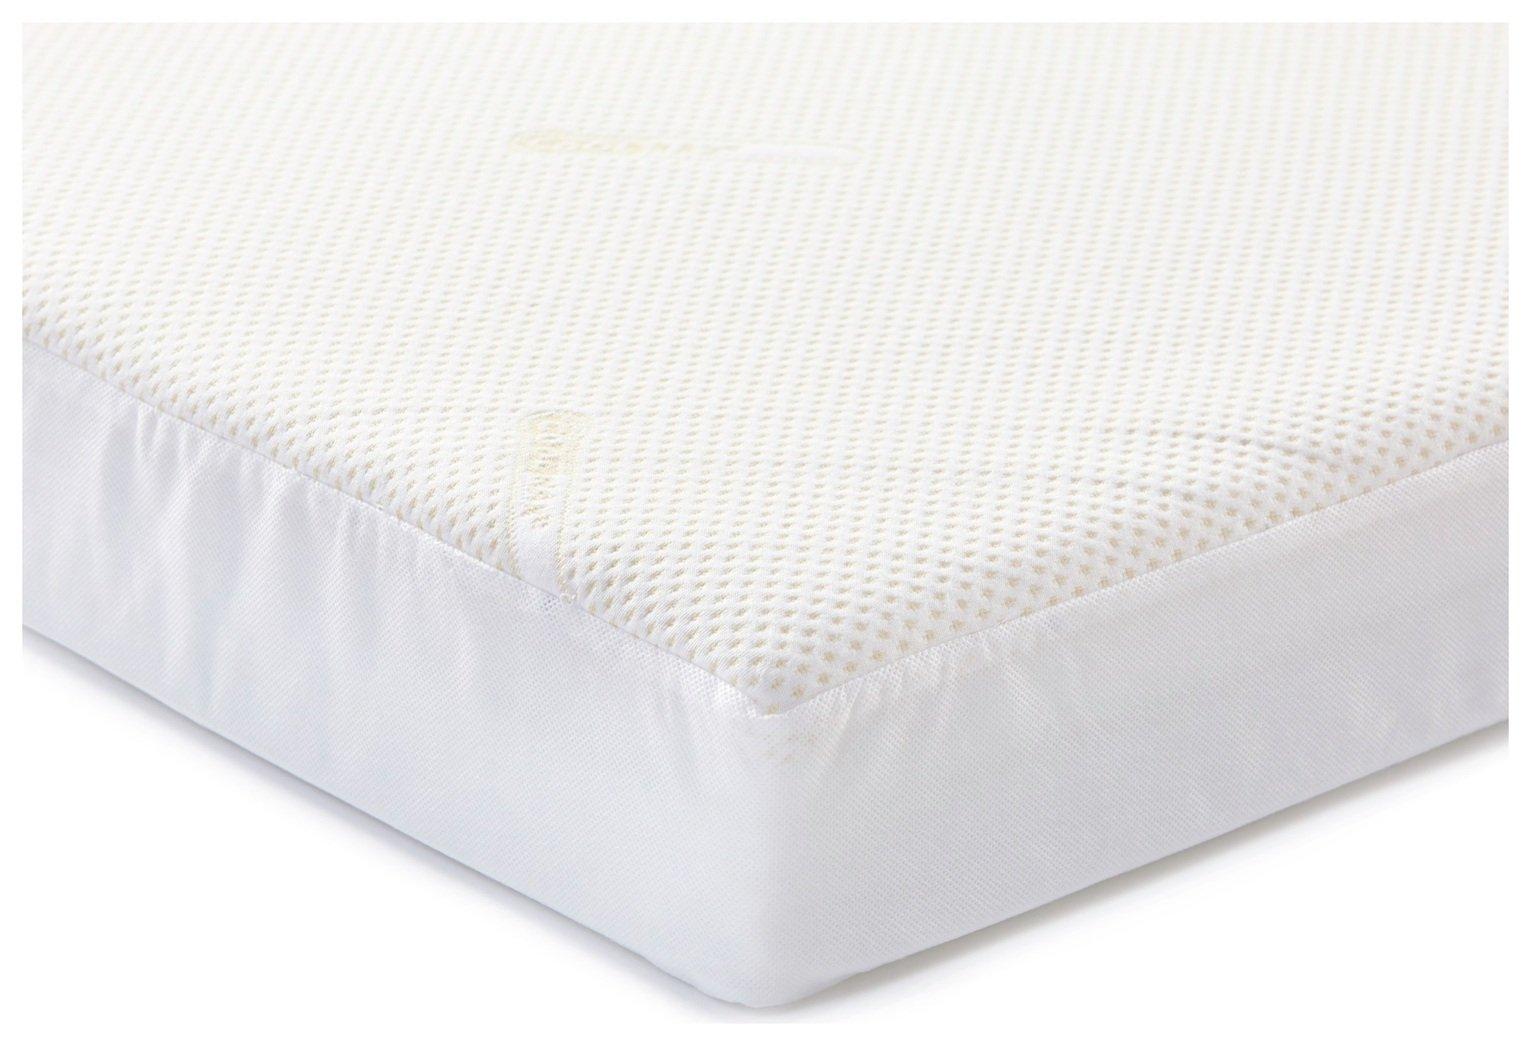 Image of Baby Elegance Coolmax Pocket Sprung Cot Bed Mattress.